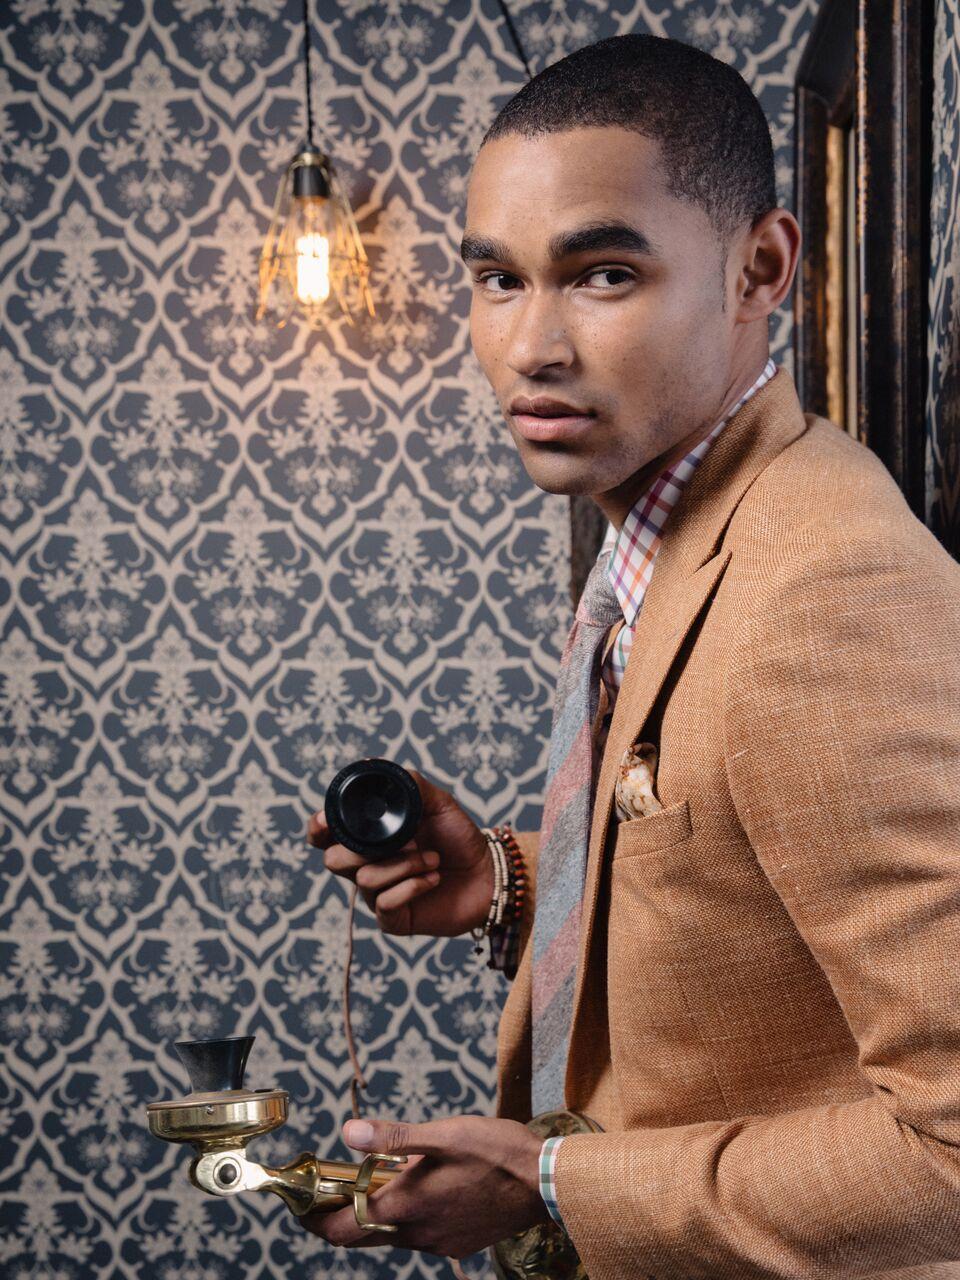 Model - Jason Baker (LA Models)  Made to Measure Suit. Ready-to-Wear Necktie  Klein Epstein & Parker - Fashion Valley (San Diego)